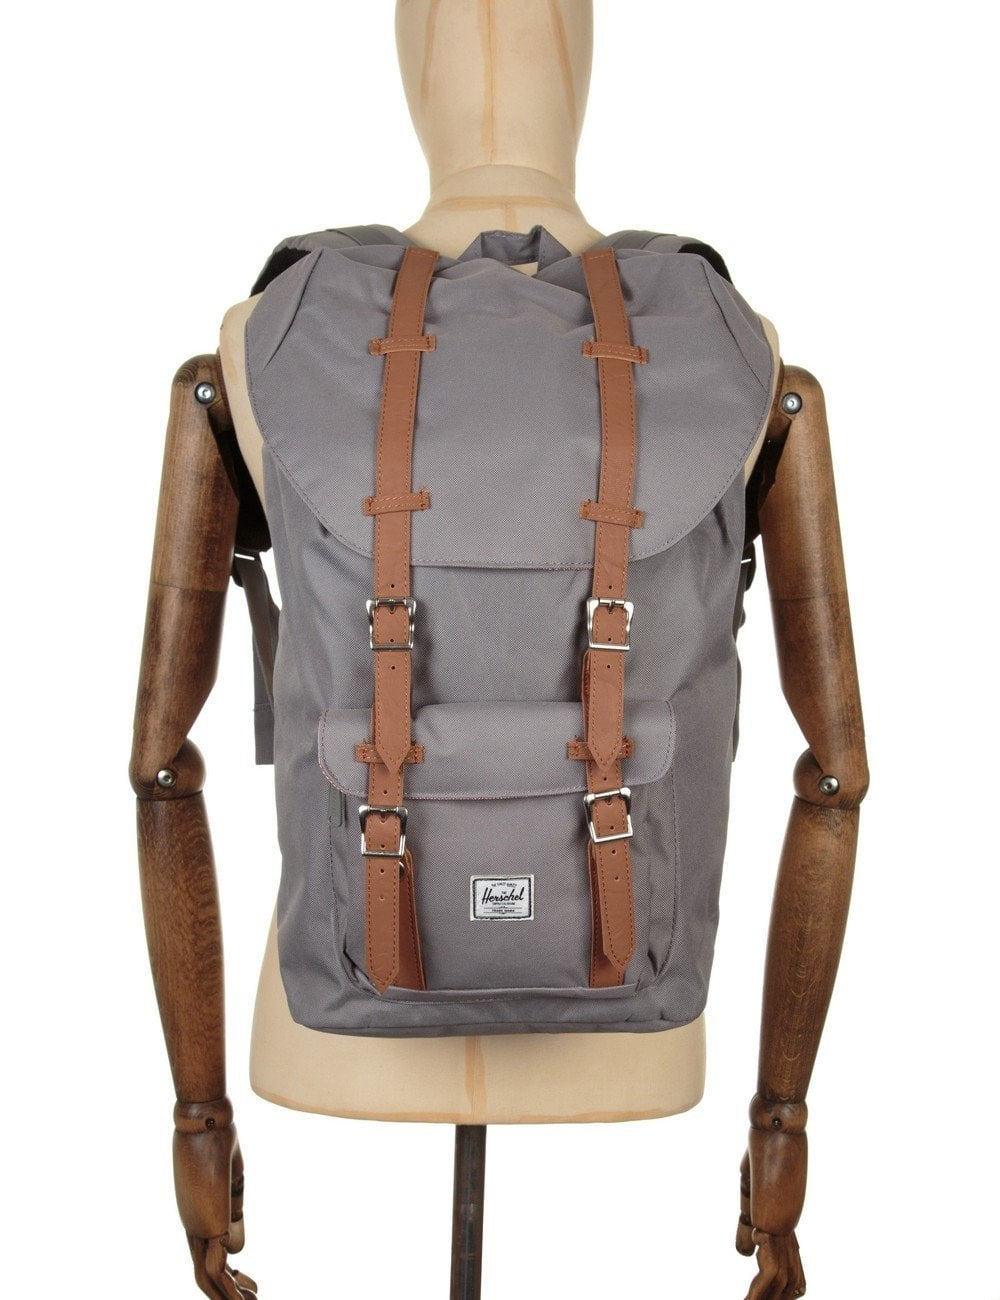 Herschel Supply Co Little America Backpack - Grey Tan - Accessories ... d91c4ae9c82ef